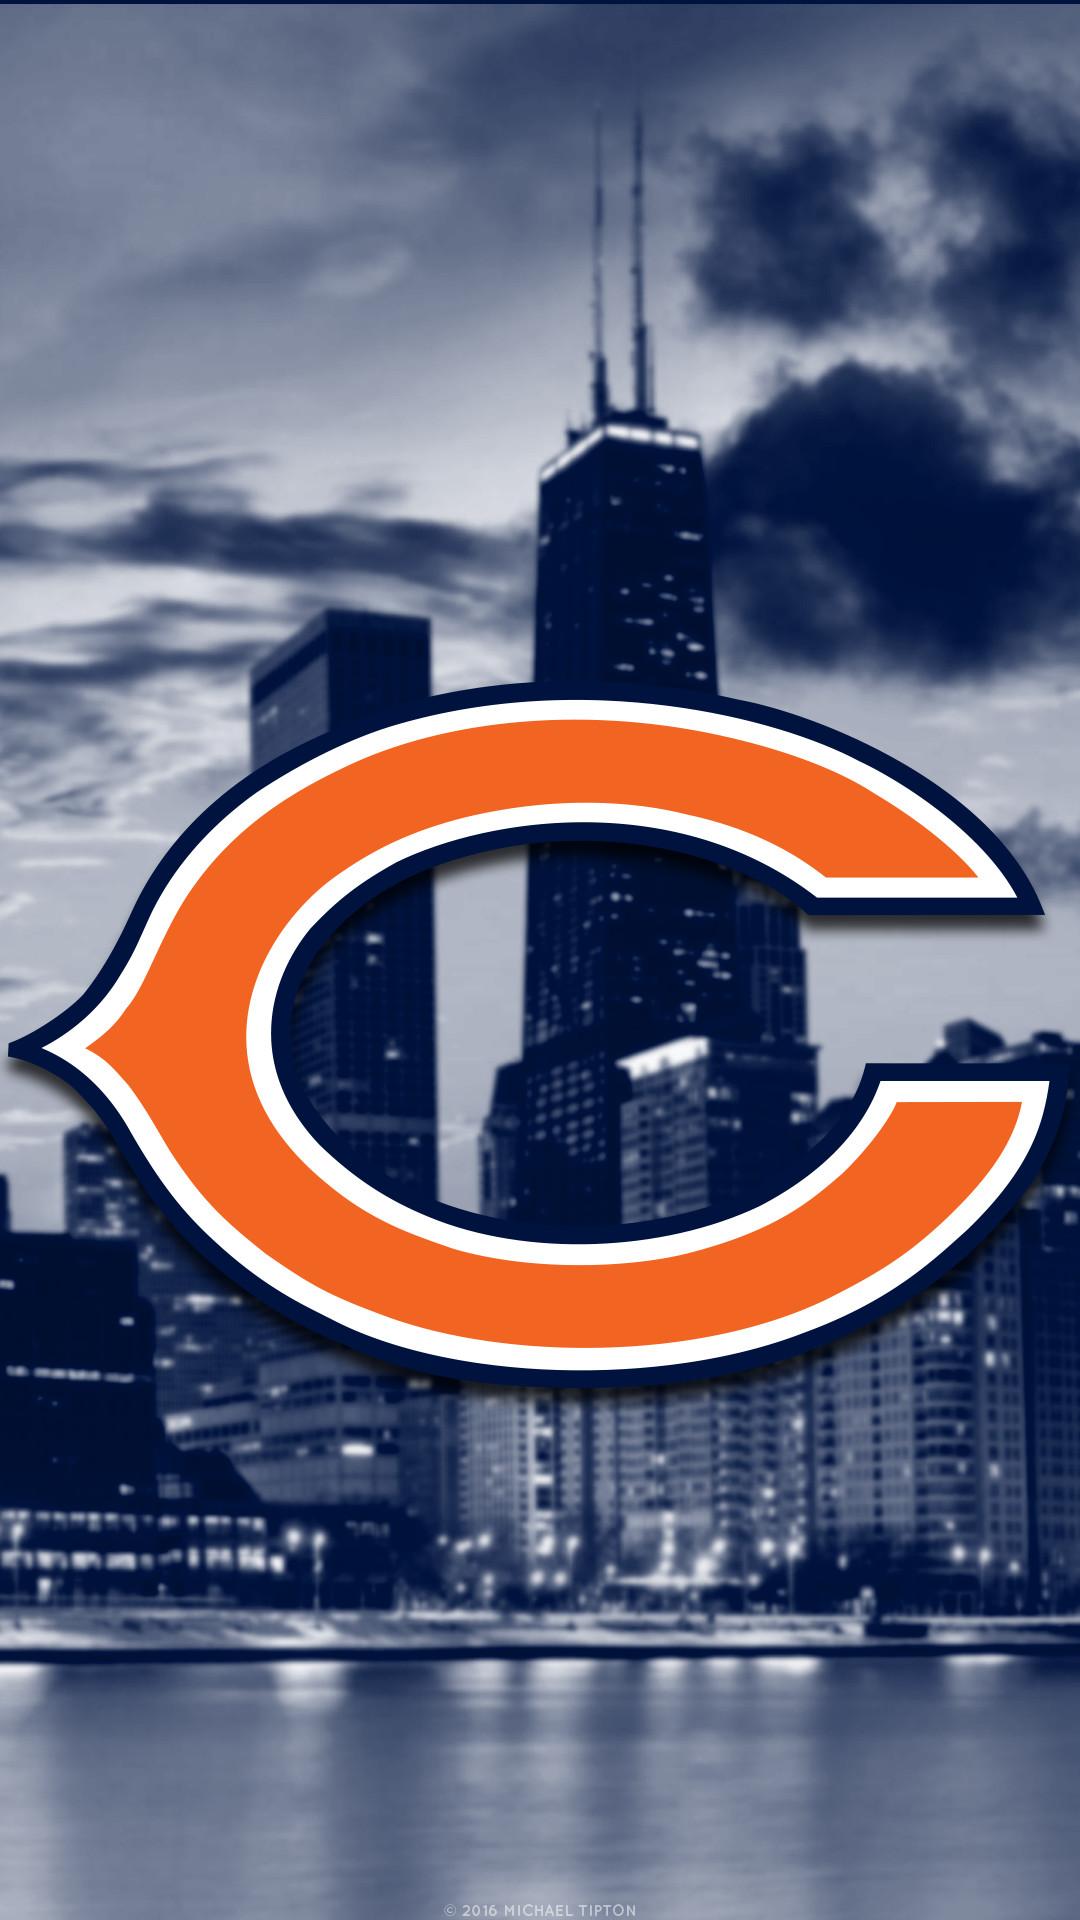 Chicago Bears 2017 football logo wallpaper pc desktop computer. Desktop PC  | iPhone | Android